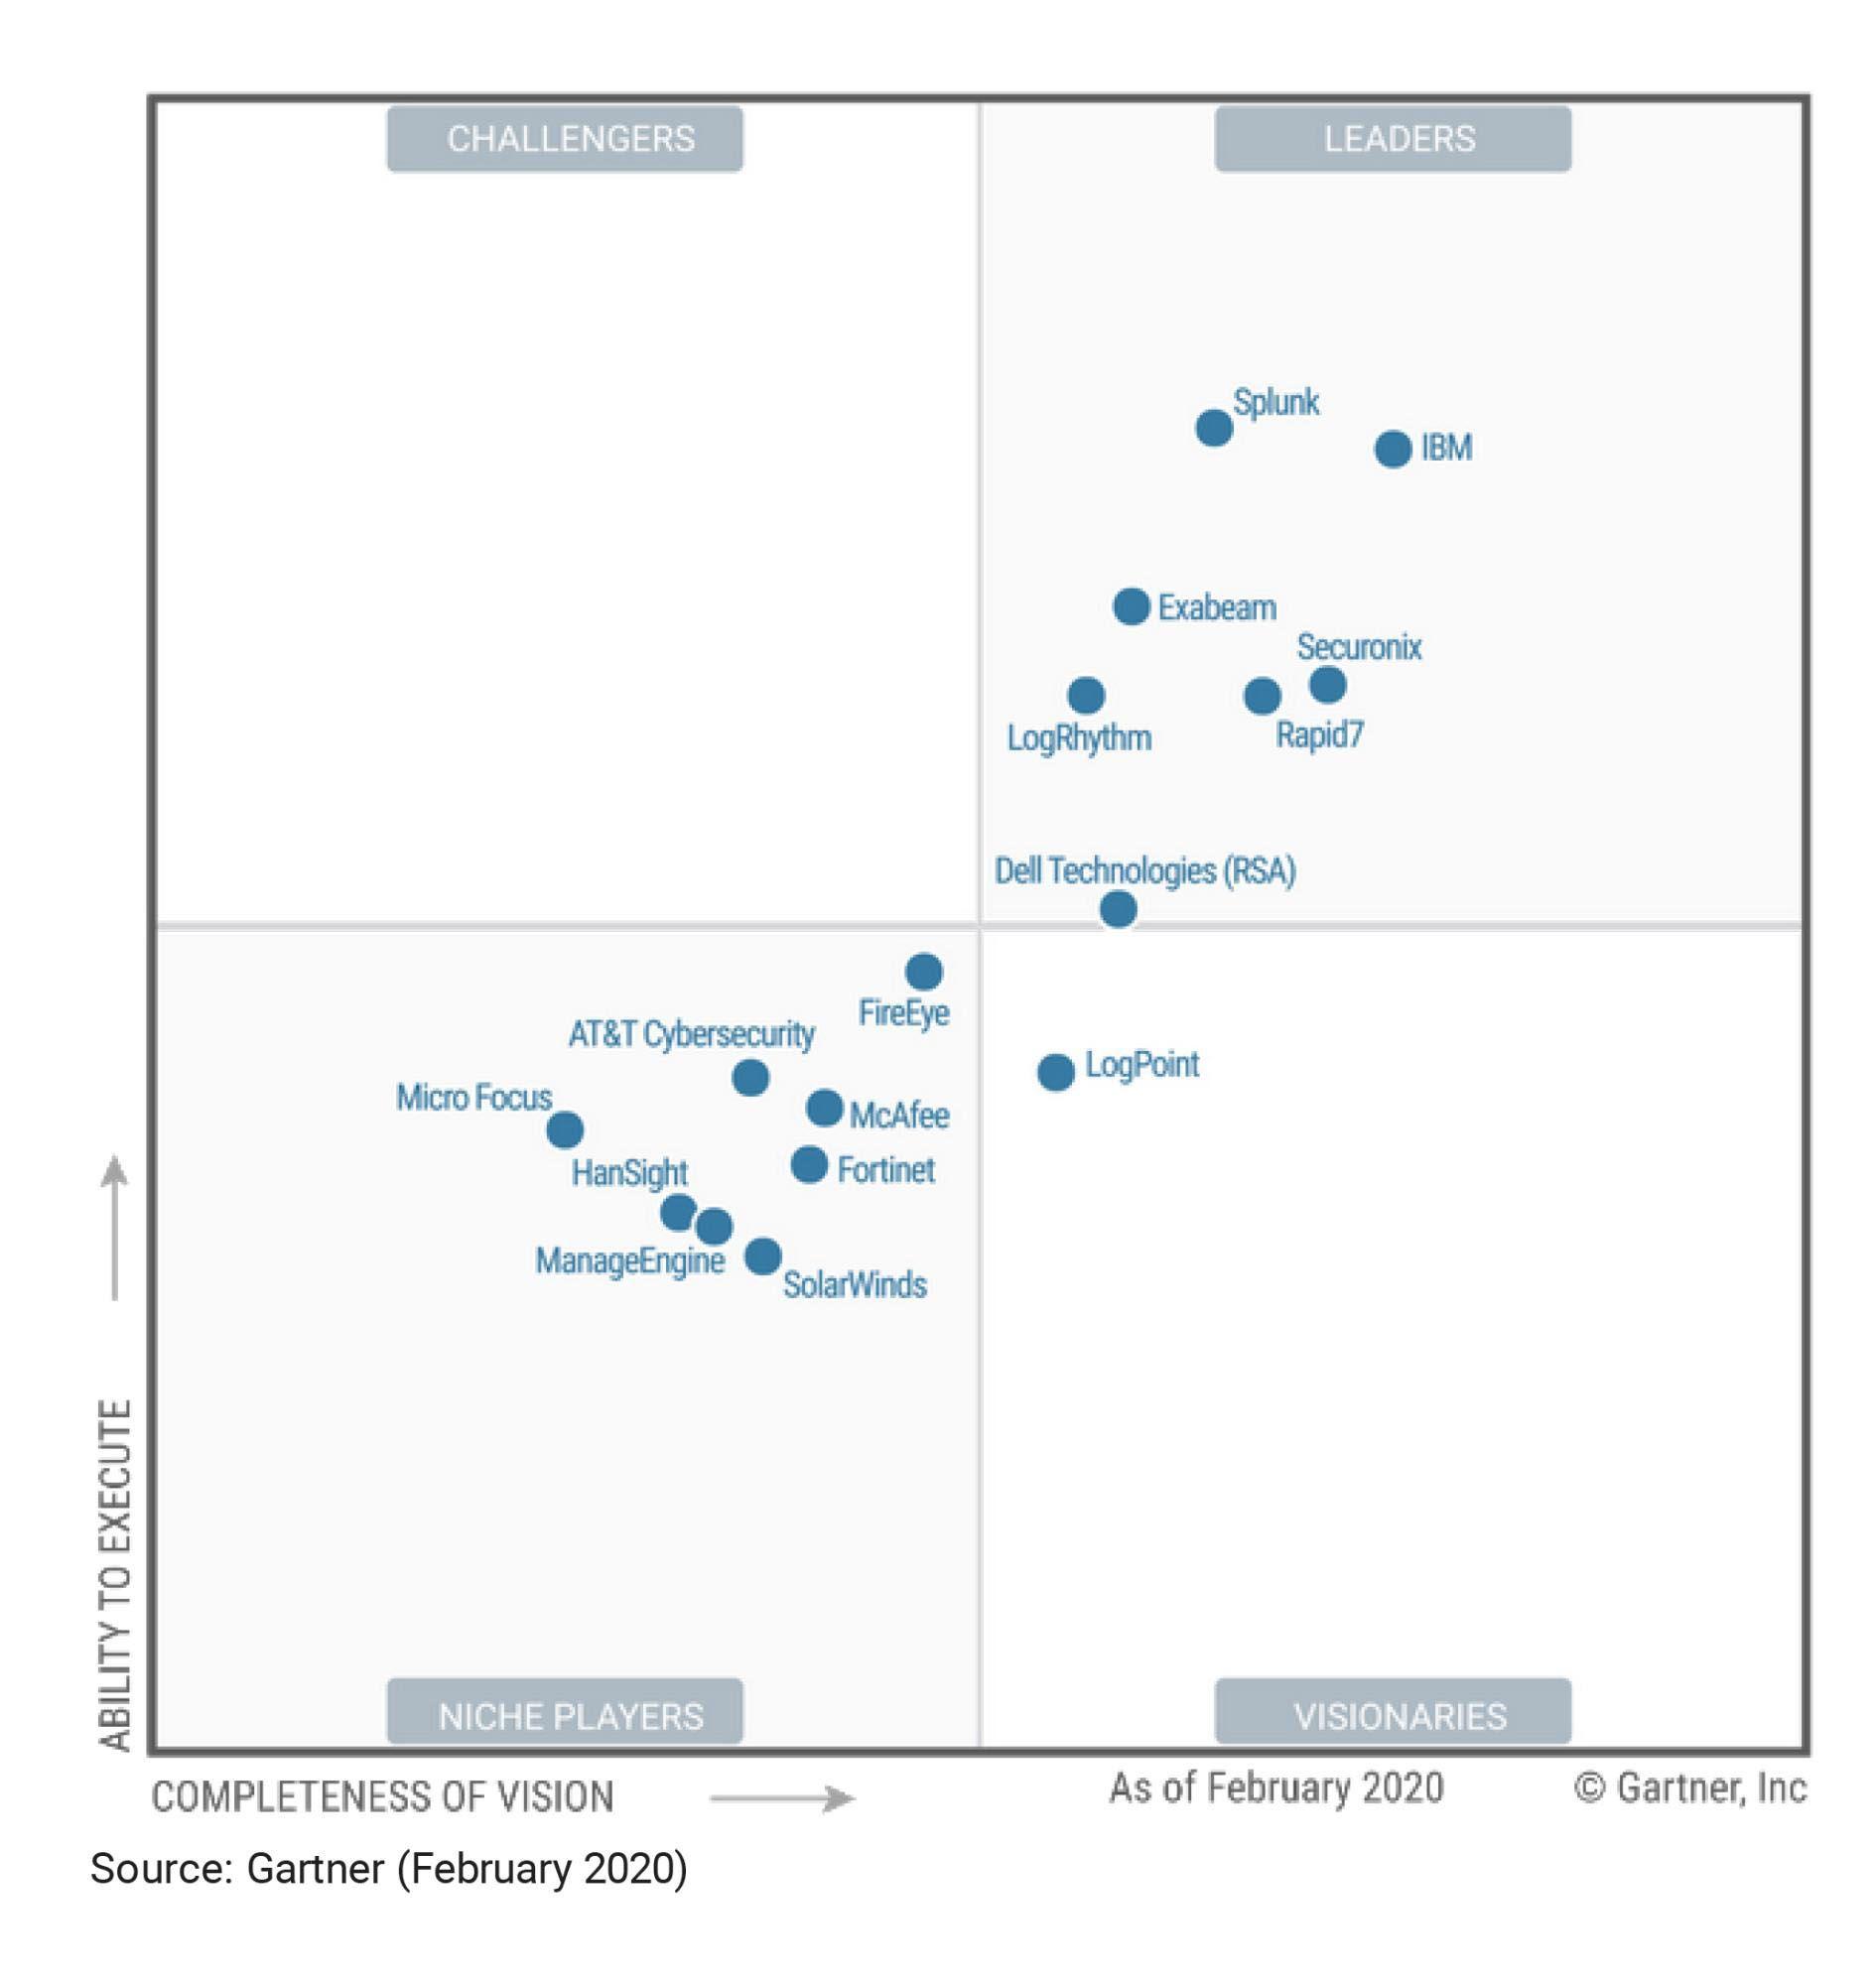 2020 Gartner Magic Quadrant for SIEM Image ranking the top SIEM vendors